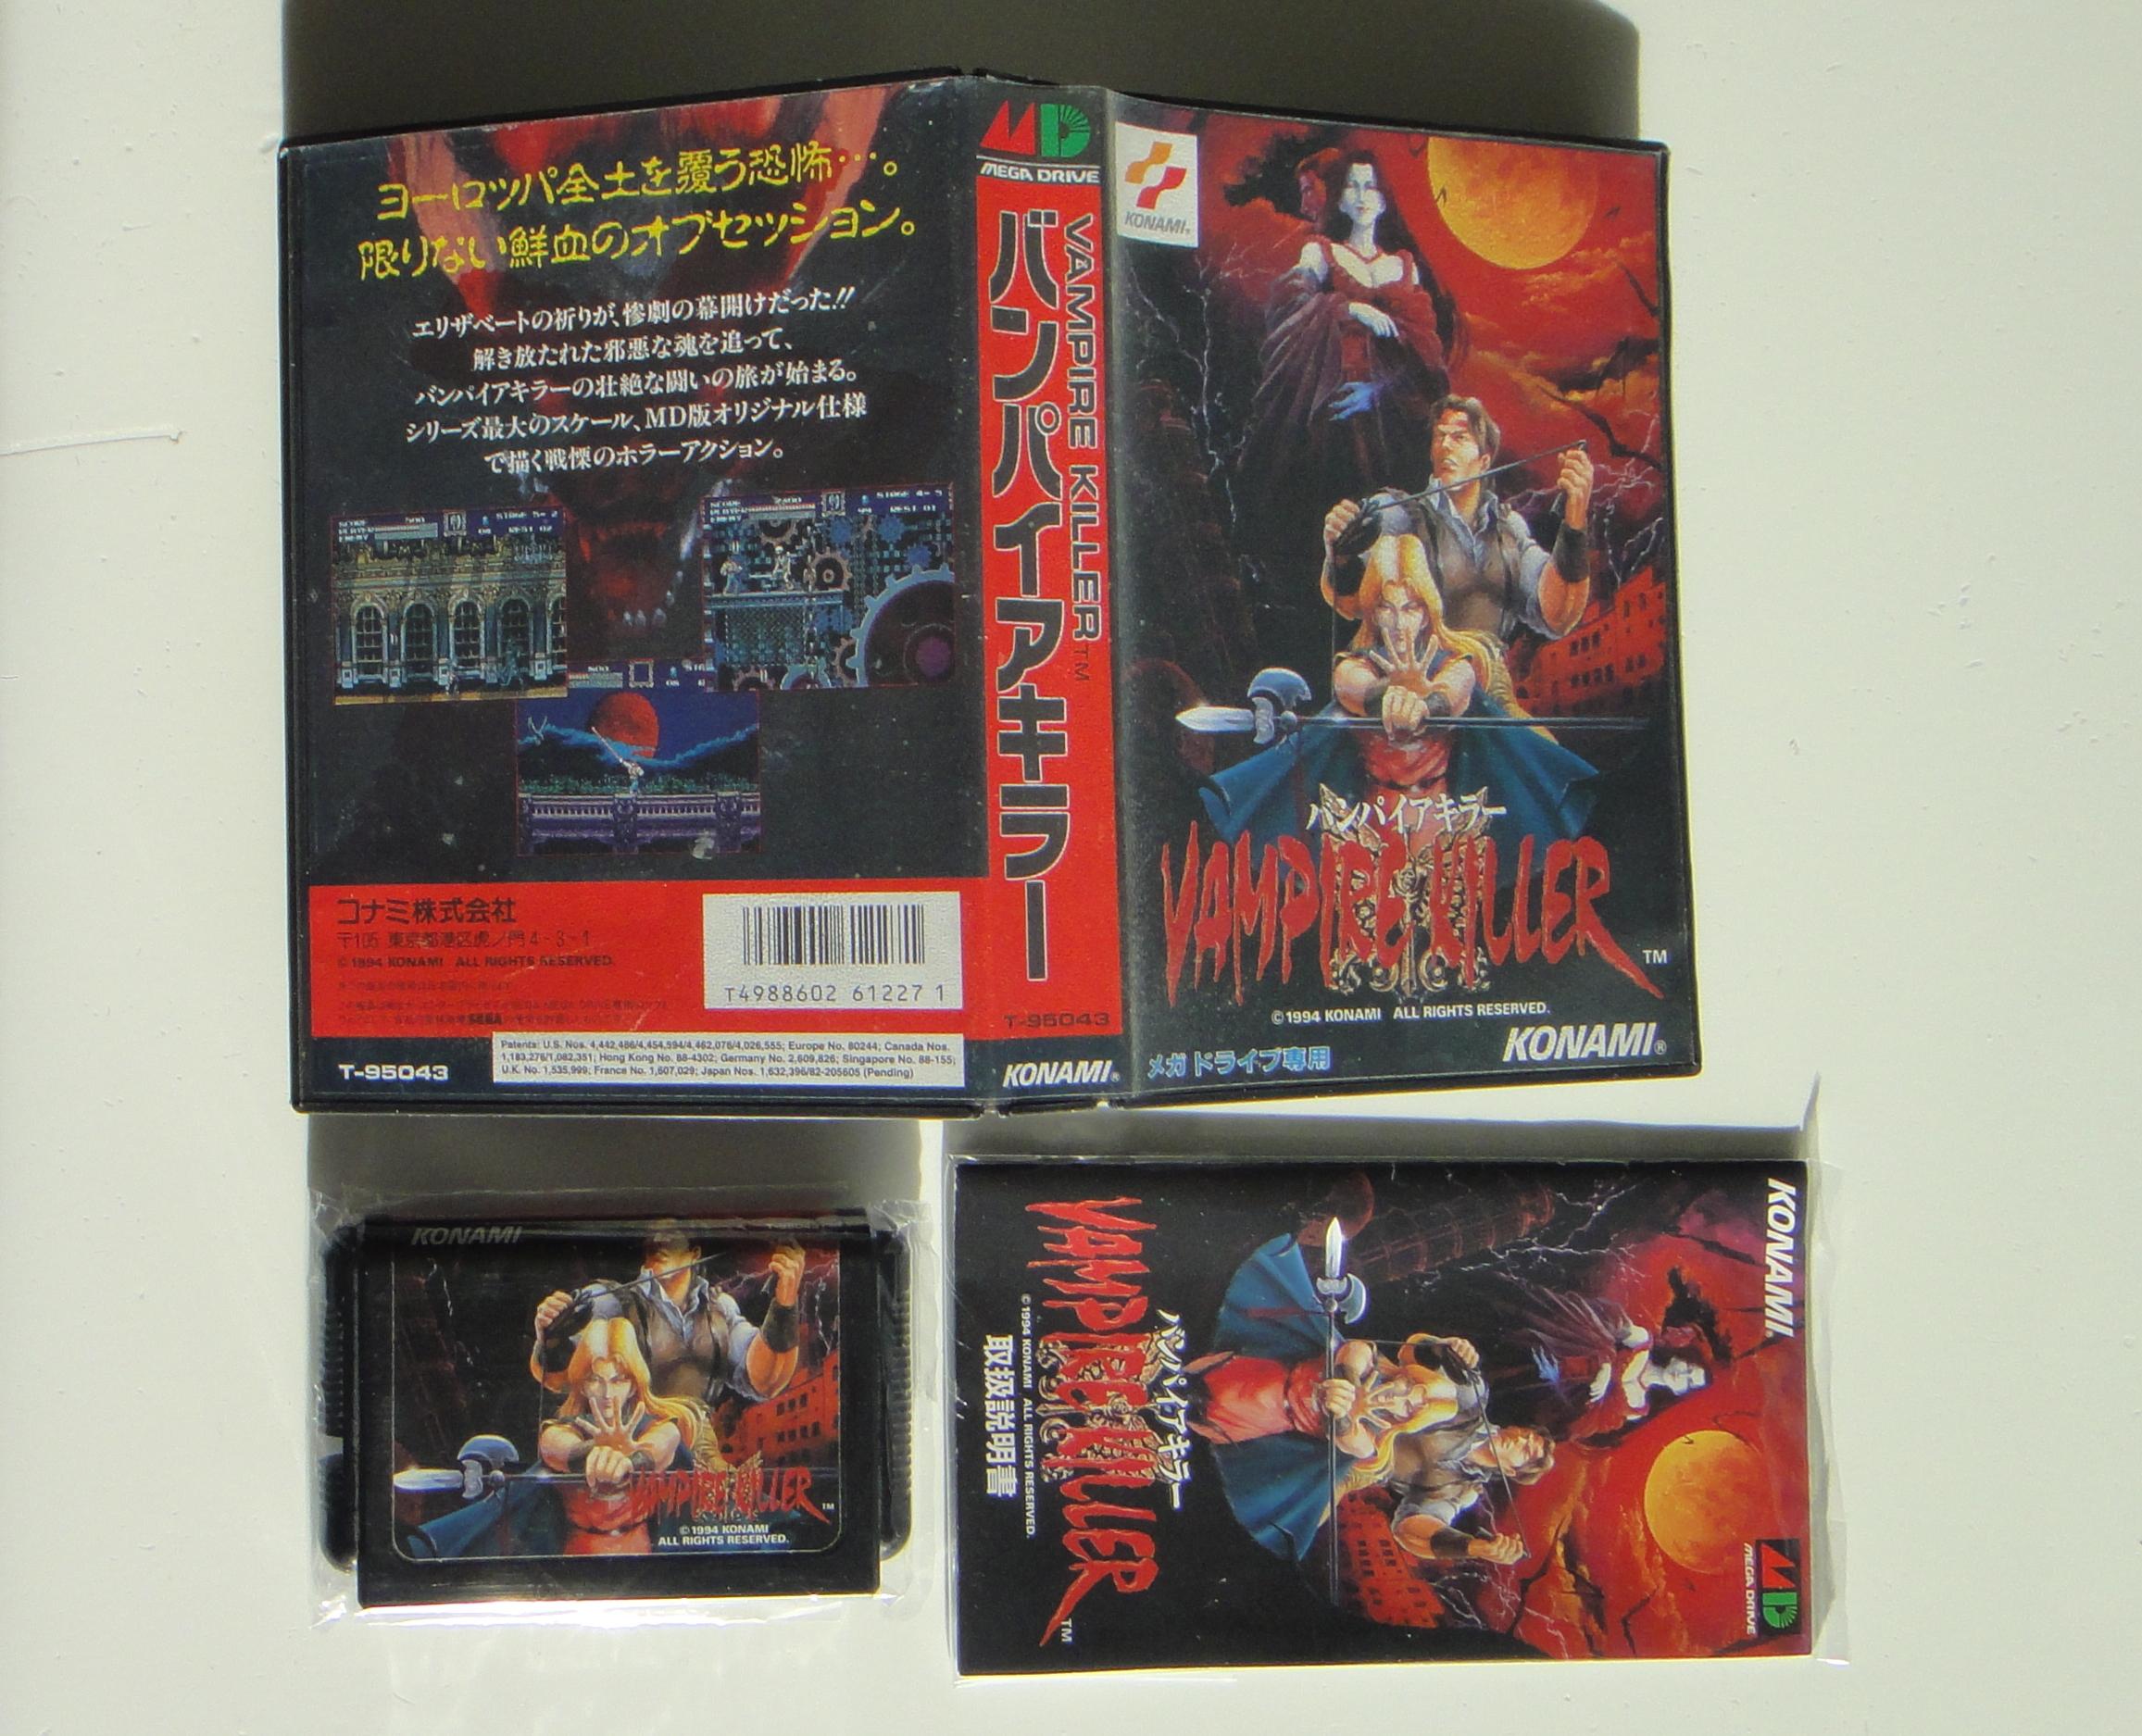 Vampire Killer sur Megdrive Jap [VENDU] 258621Clipboard02